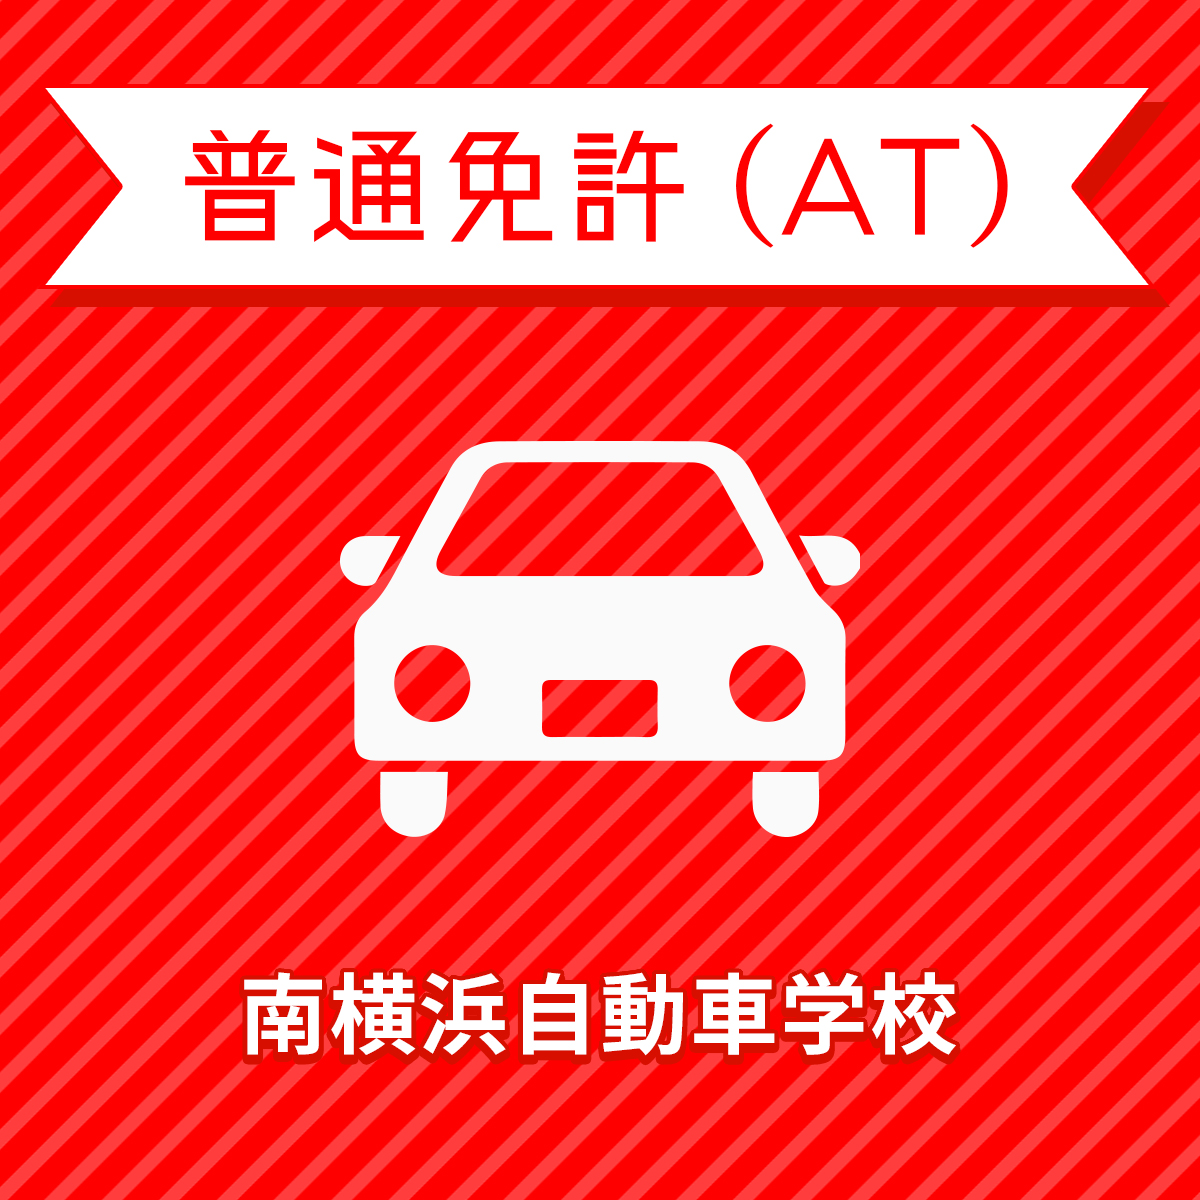 【神奈川県横浜市】普通車ATコース(通常料金)<免許なし/原付免許所持対象>